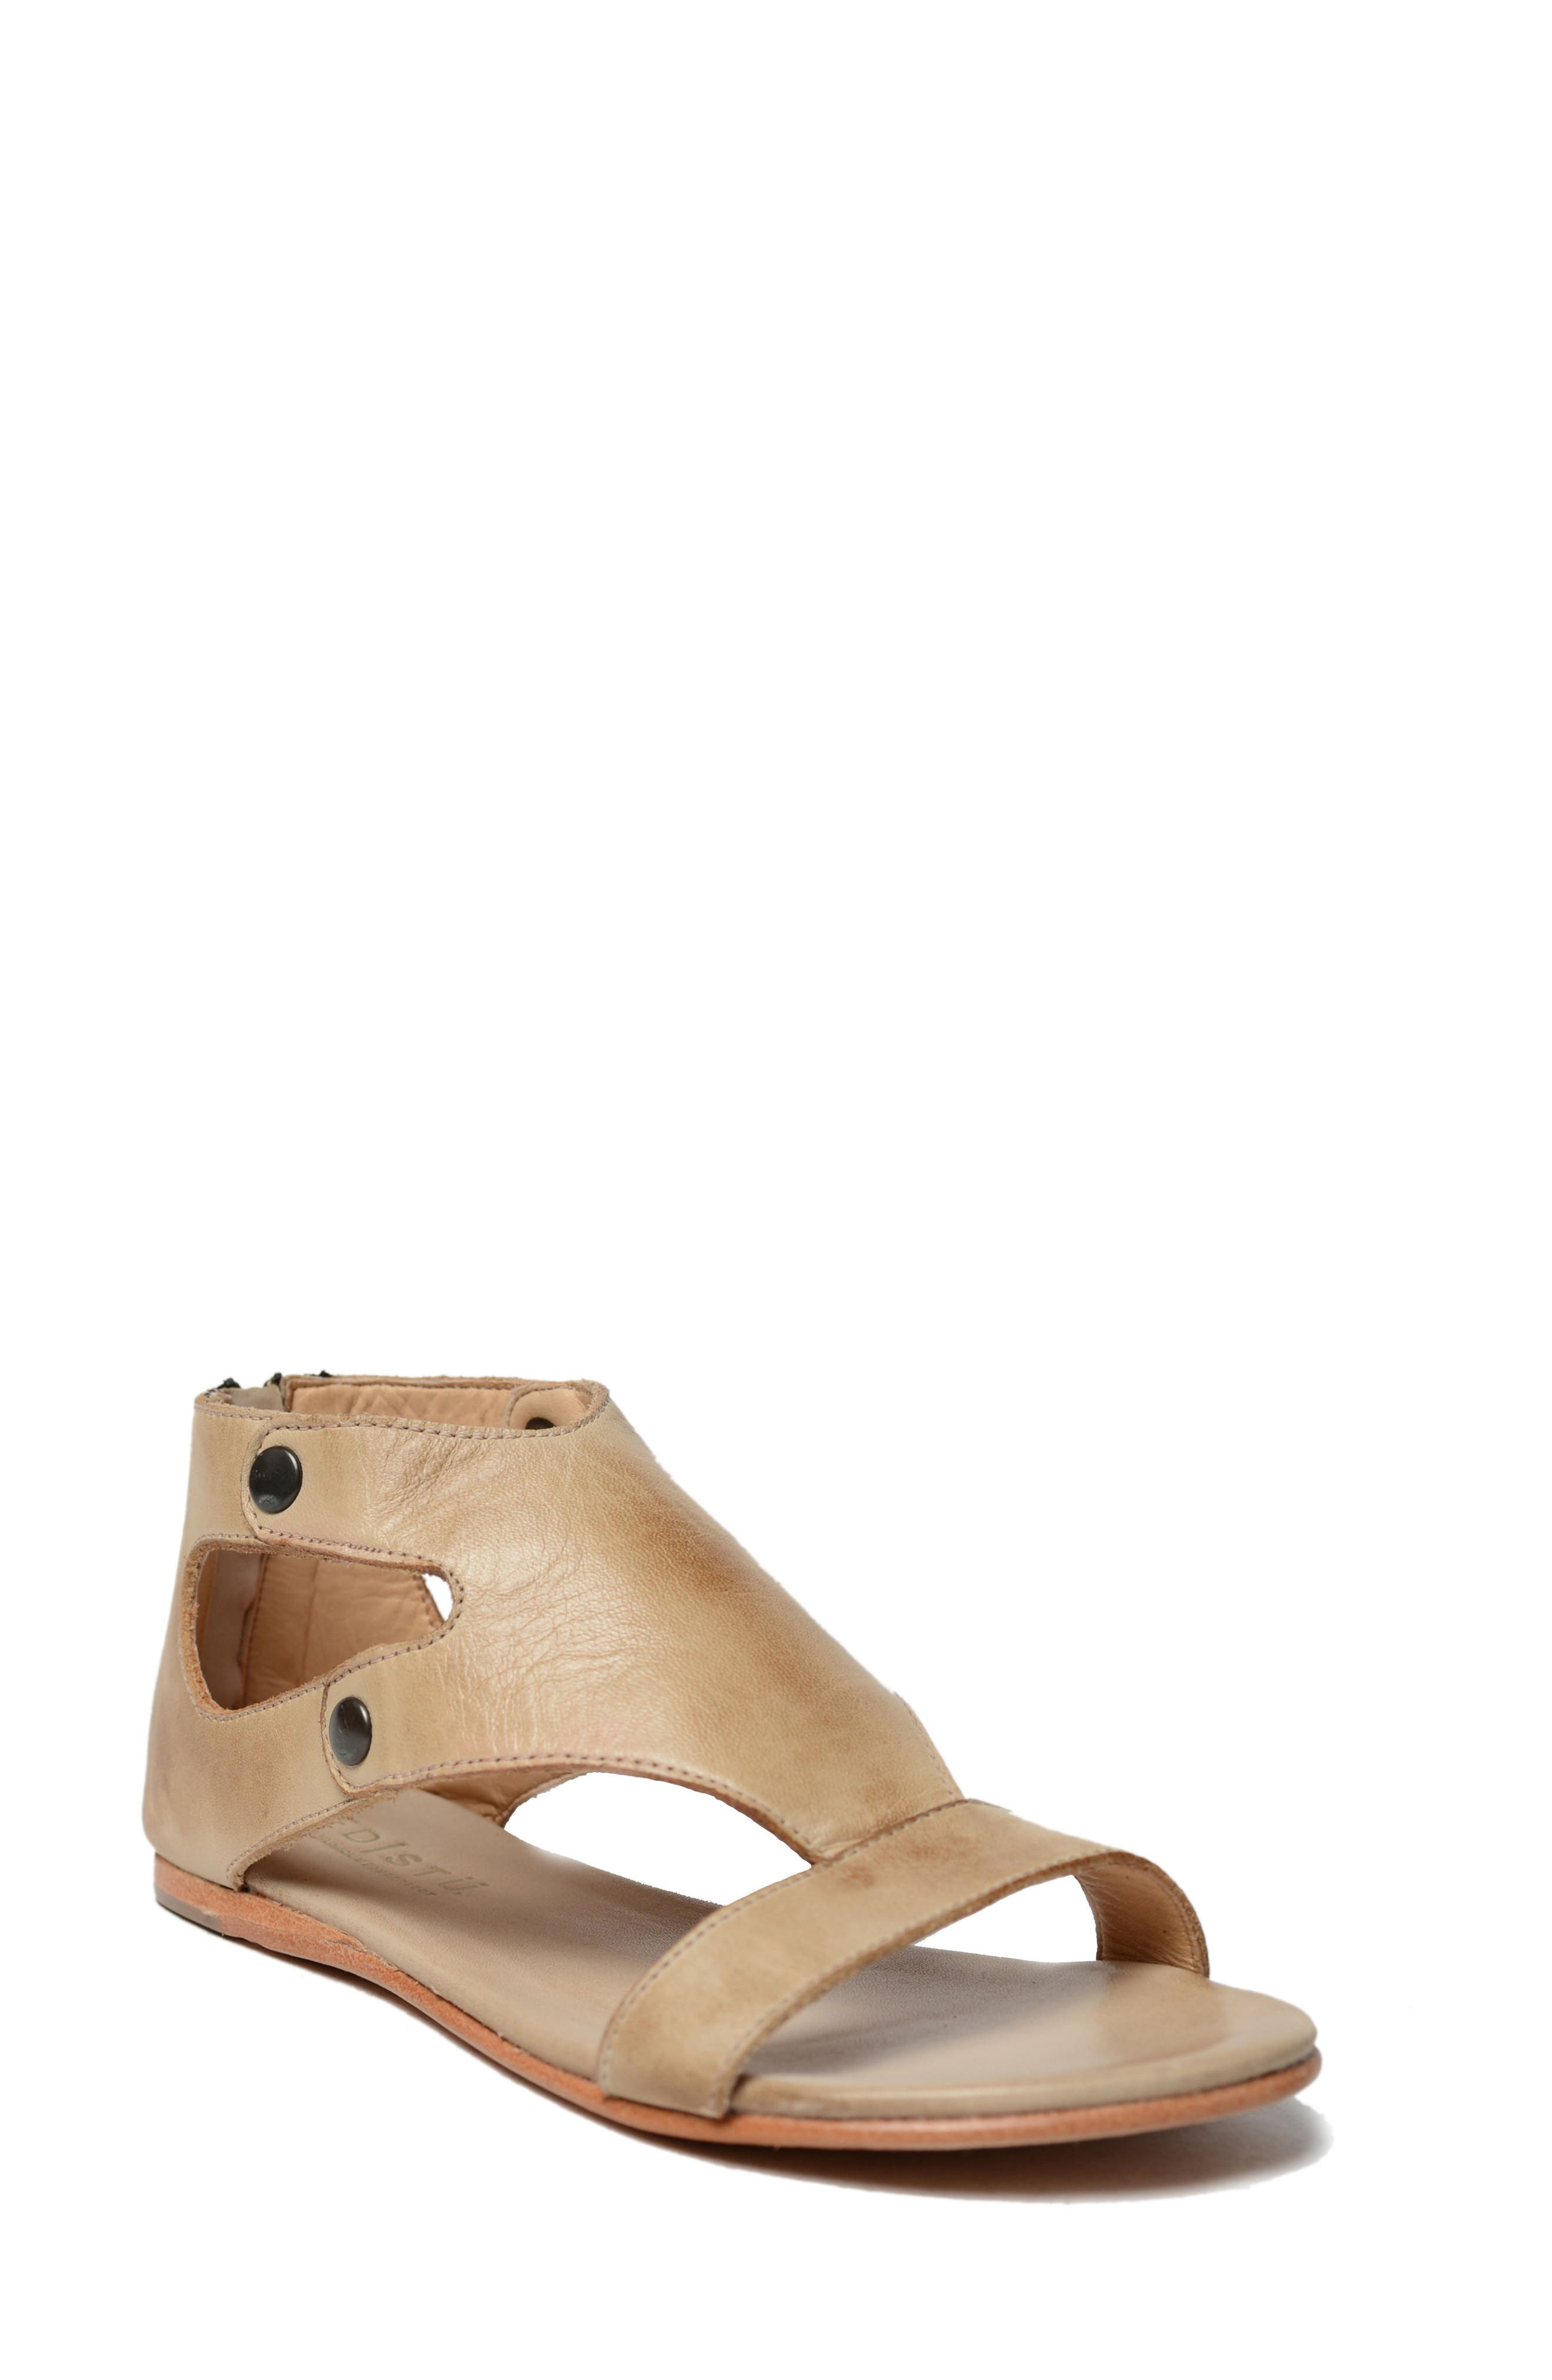 Soto Sandal,                             Main thumbnail 1, color,                             Sand Rustic Leather